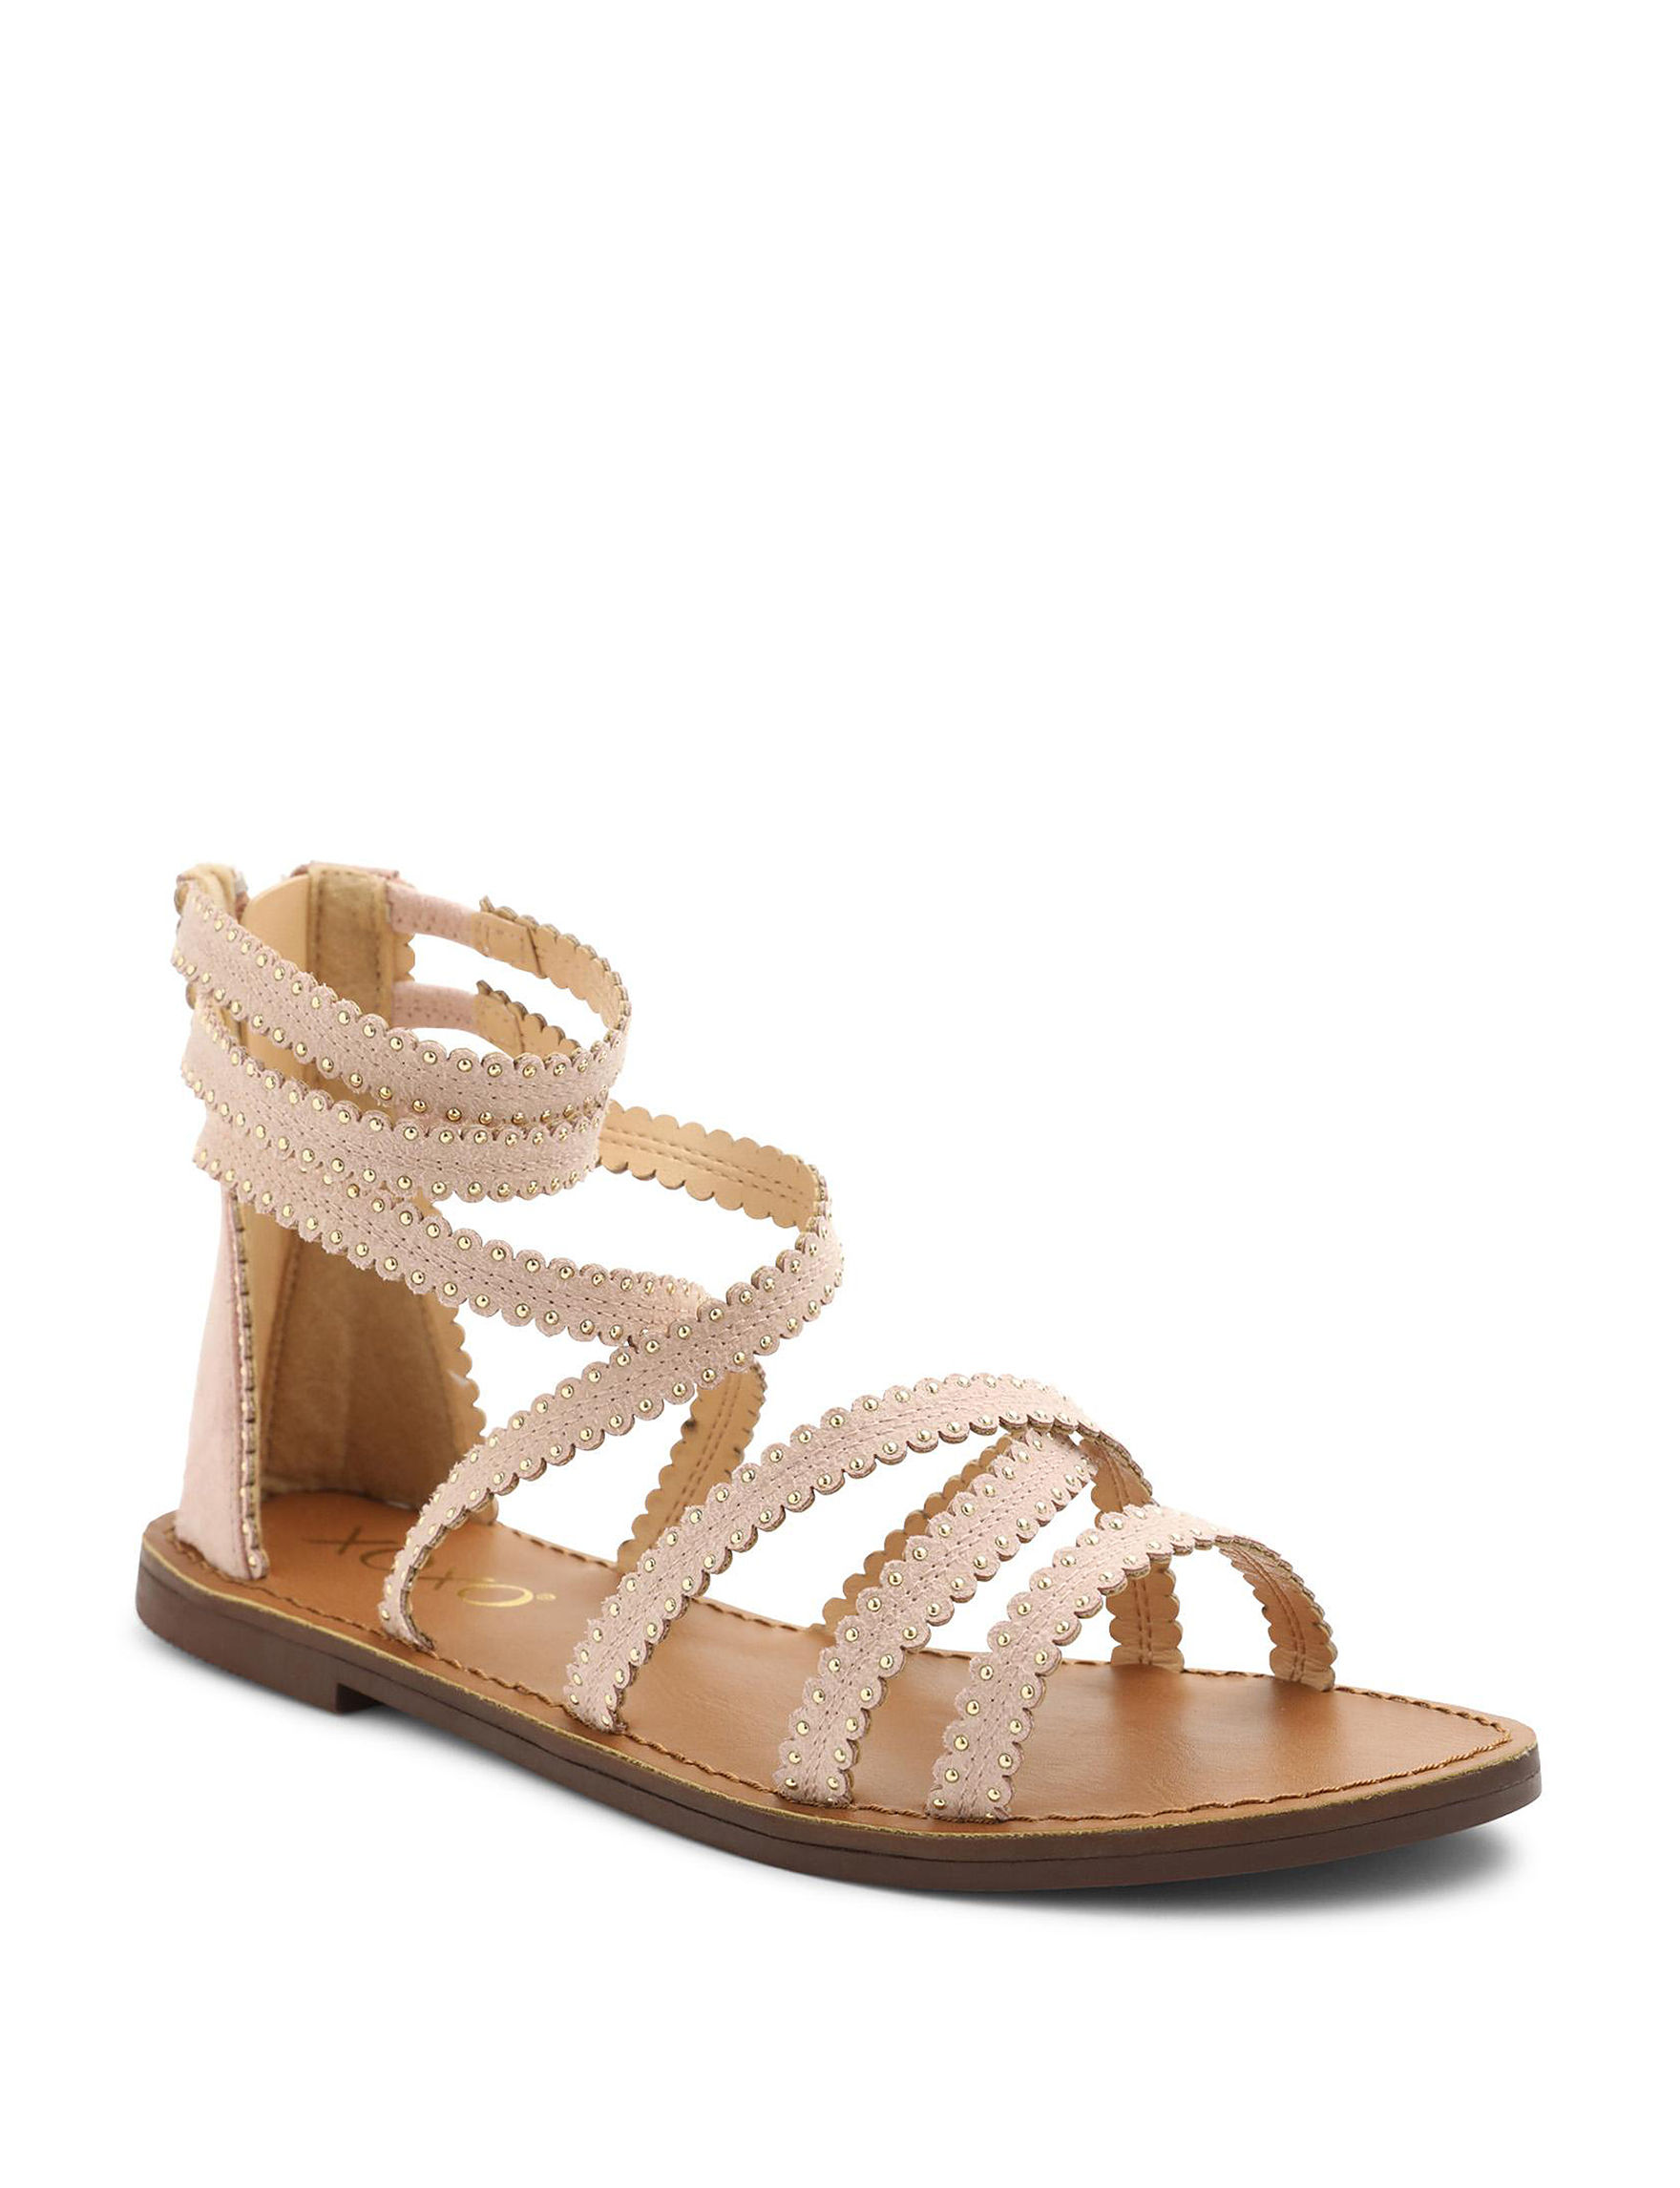 XOXO Blush Flat Sandals